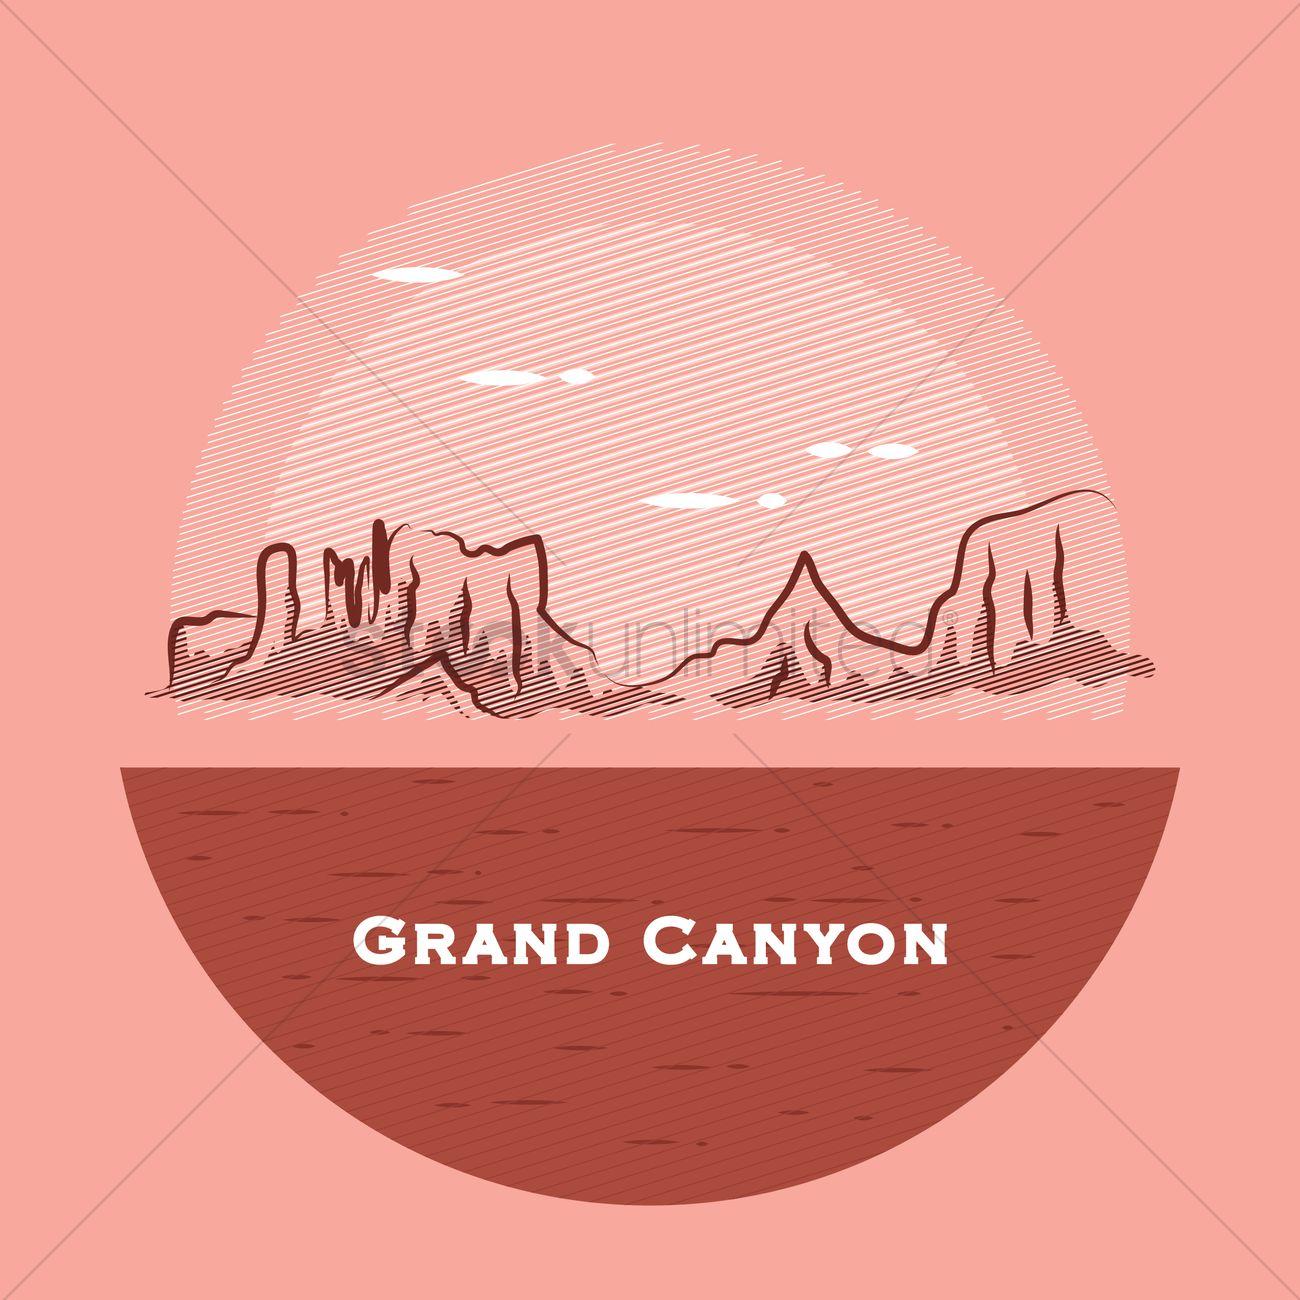 1300x1300 Grand Canyon Vector Image